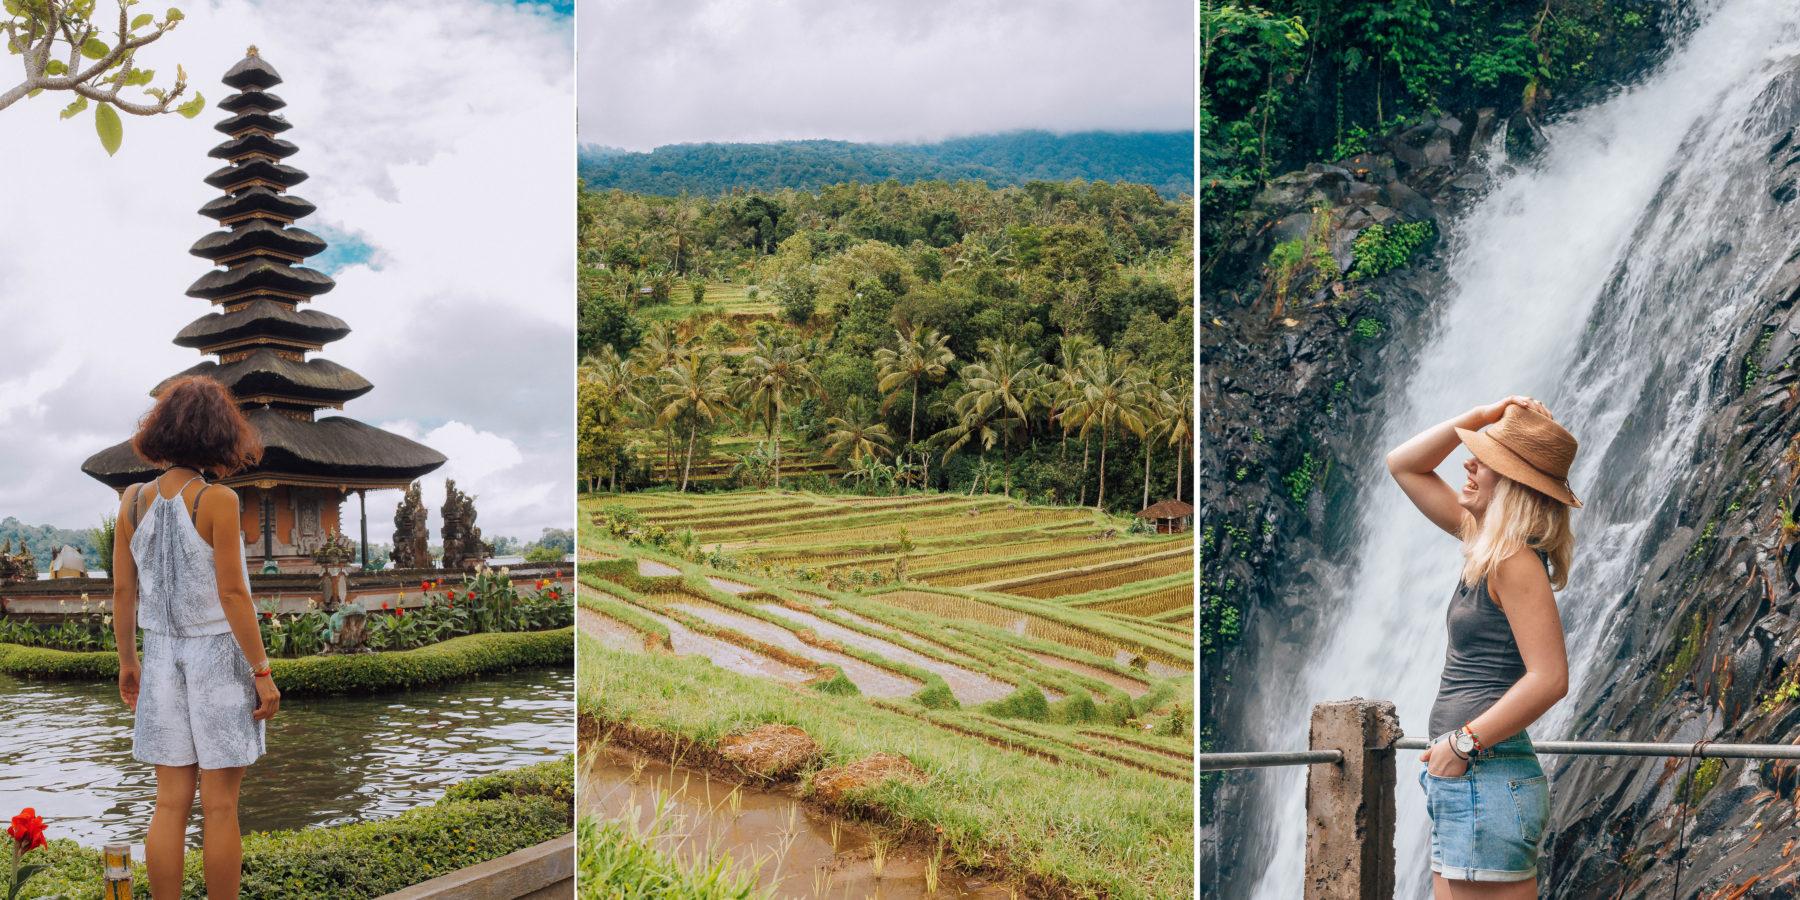 gitgit waterfall bali indonesia travel explore jungle lush green water refreshing rice terraces jungle